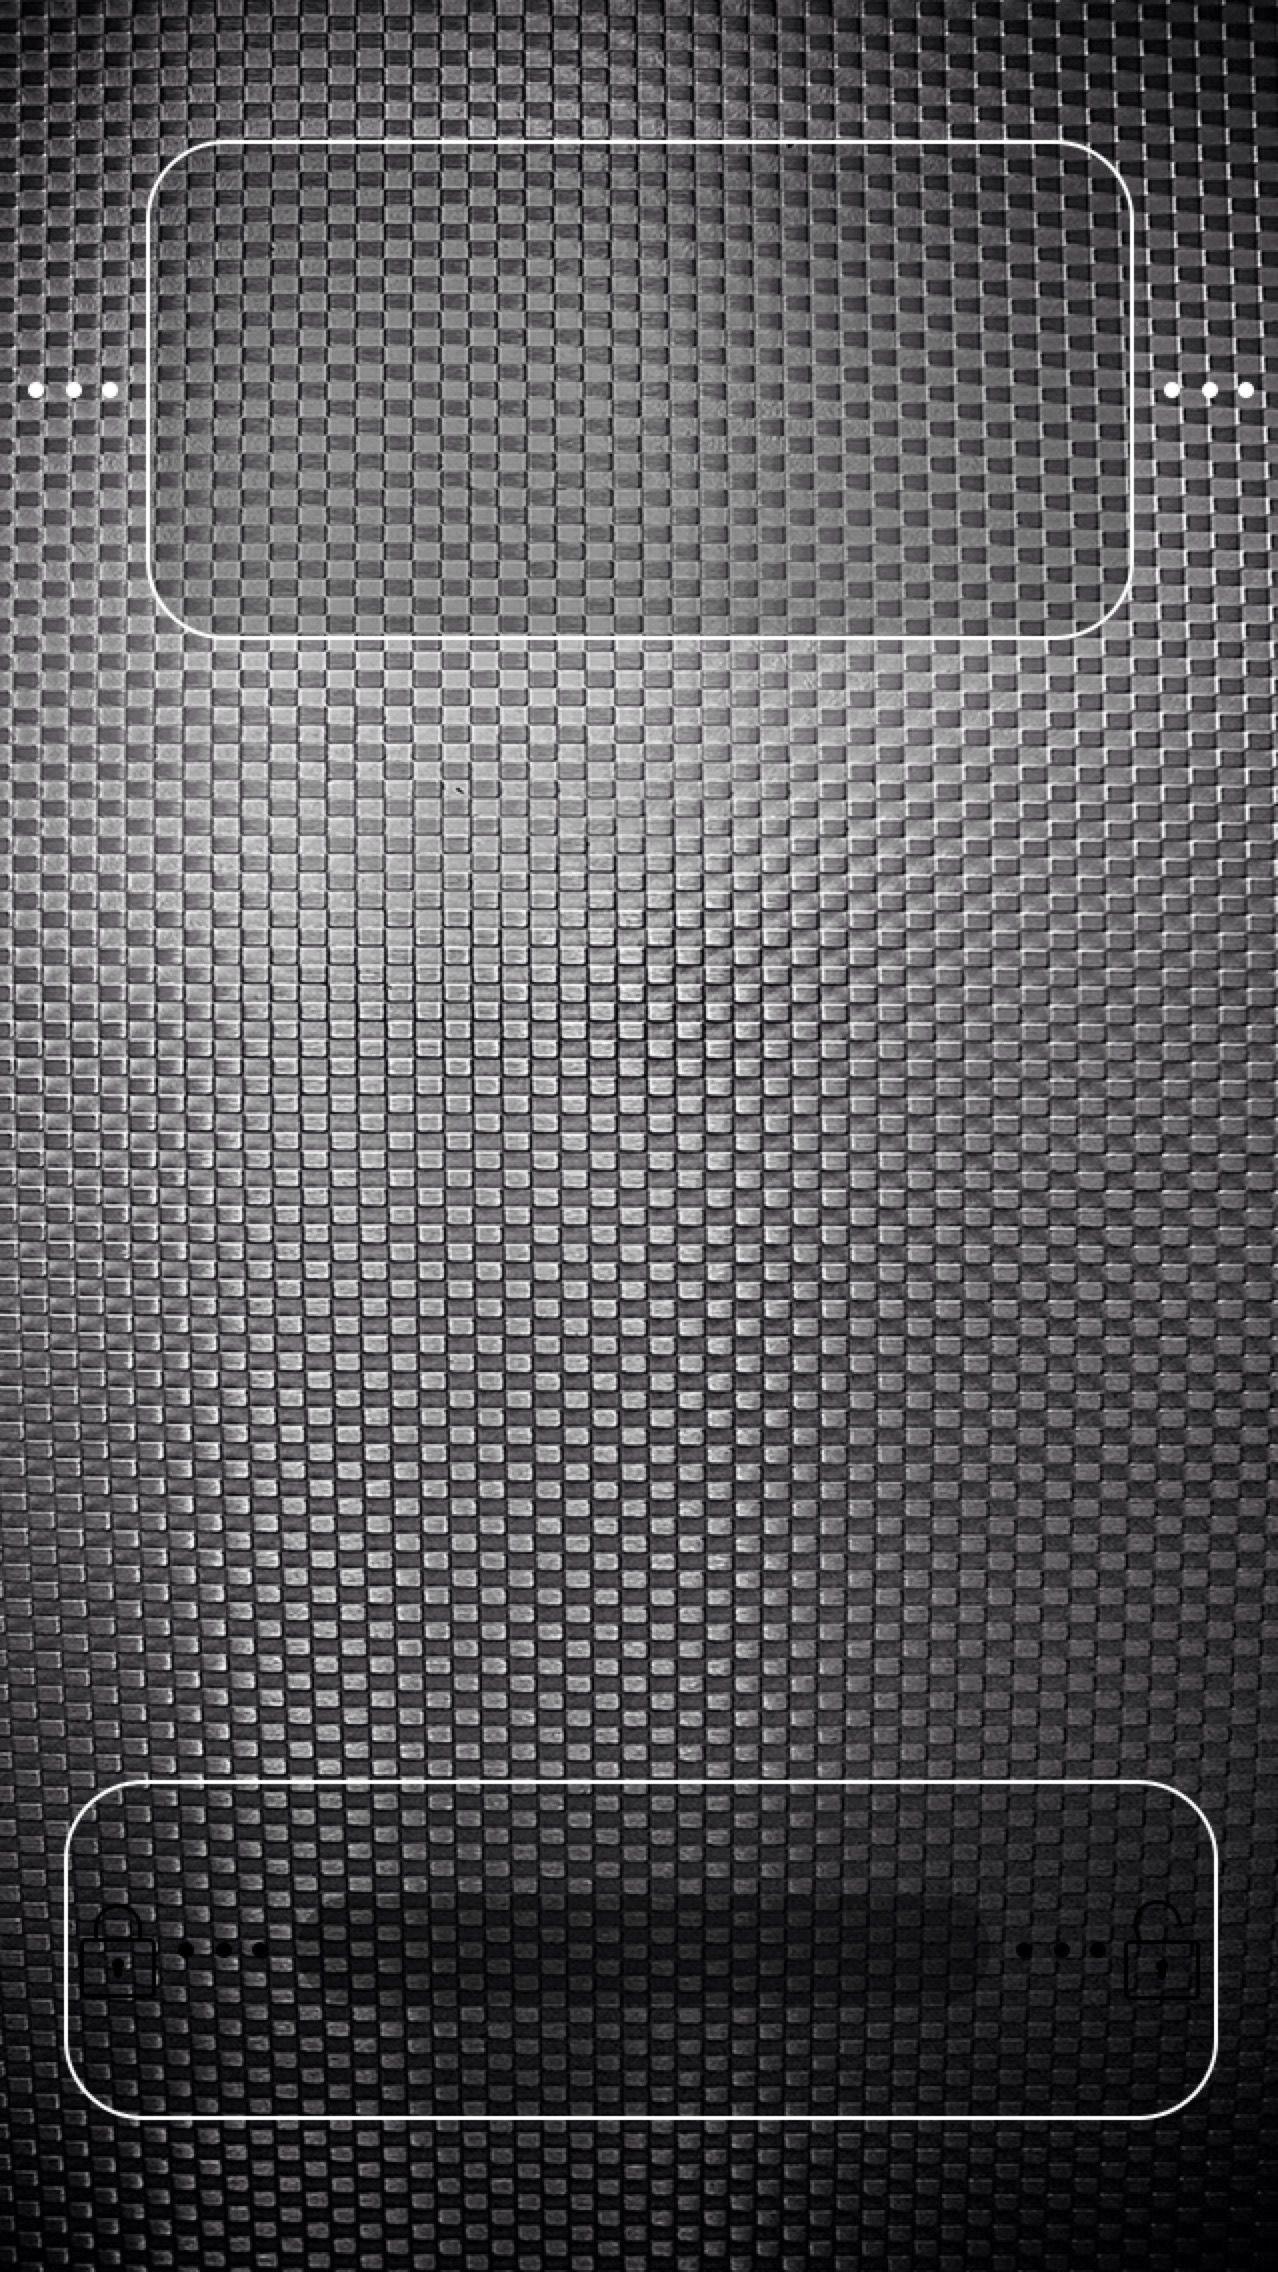 ↑↑TAP AND GET THE FREE APP! Lockscreens Metallic Structure Creative Art HD iPhone 5 Lock Screen